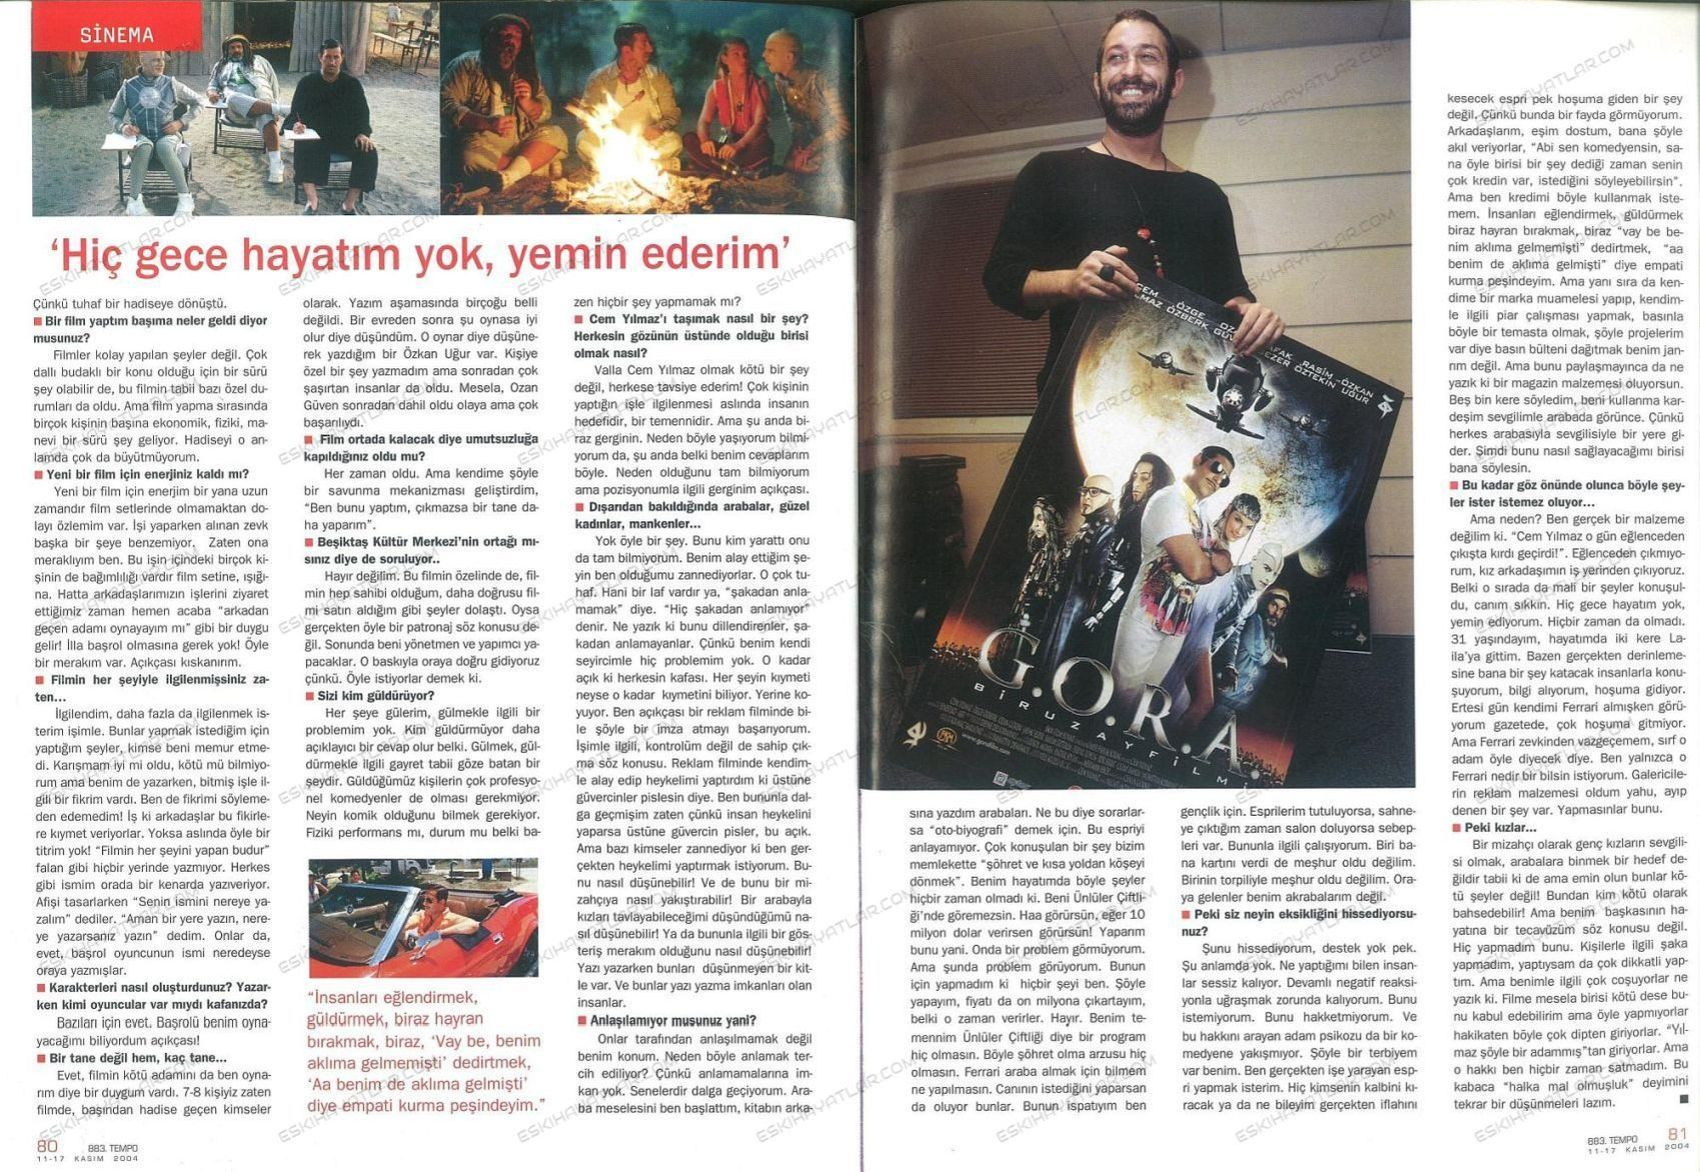 0215-gora-filmi-ne-zaman-cekildi-2004-tempo-dergisi-cem-yilmaz-roportaji (2)